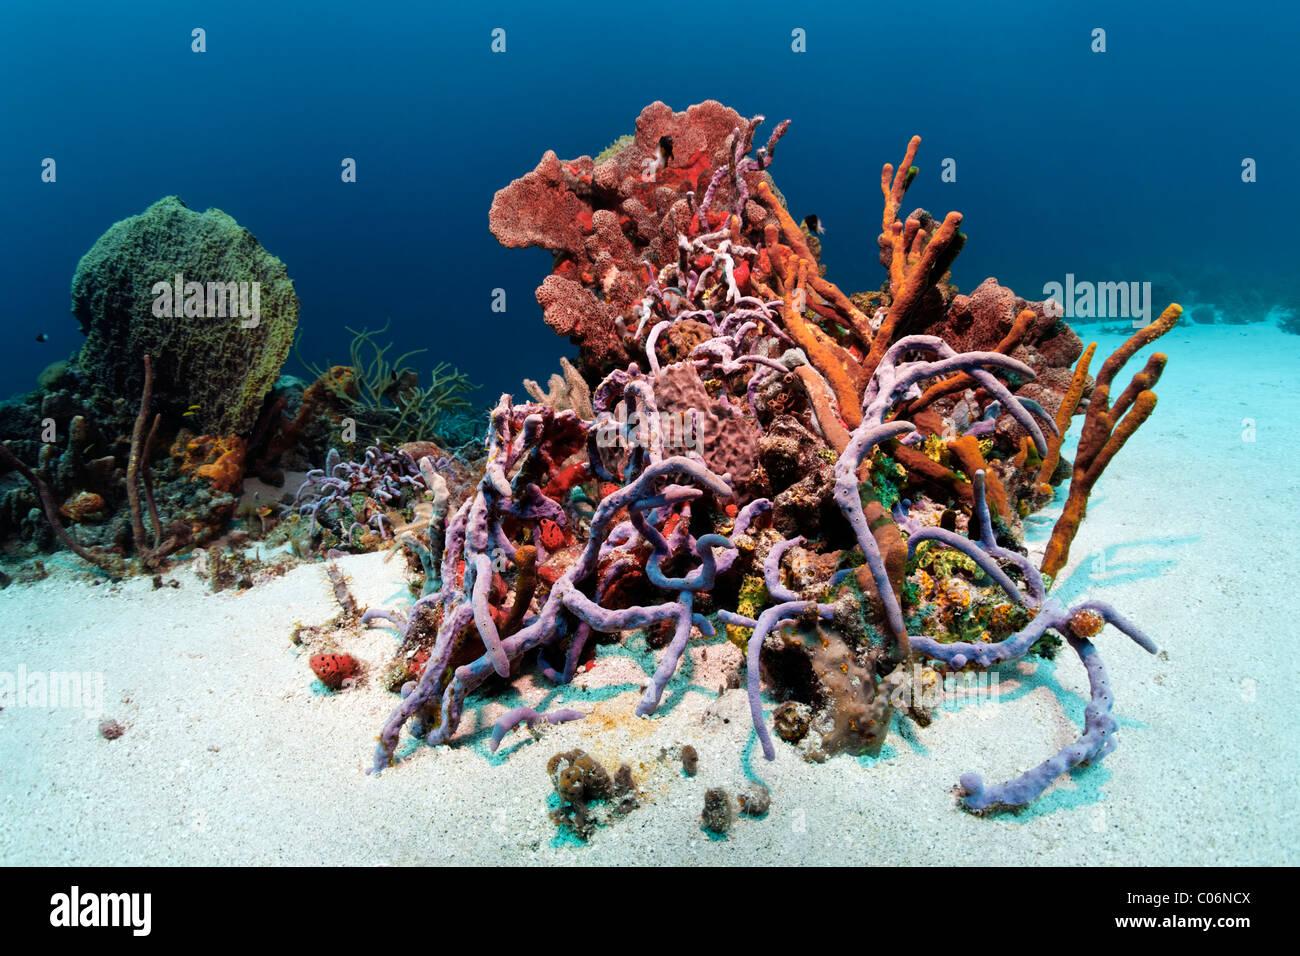 Reef block, coral reef, overgrown, multicolor, sorts, sponges, corals, sand ground, Little Tobago, Speyside, Trinidad - Stock Image